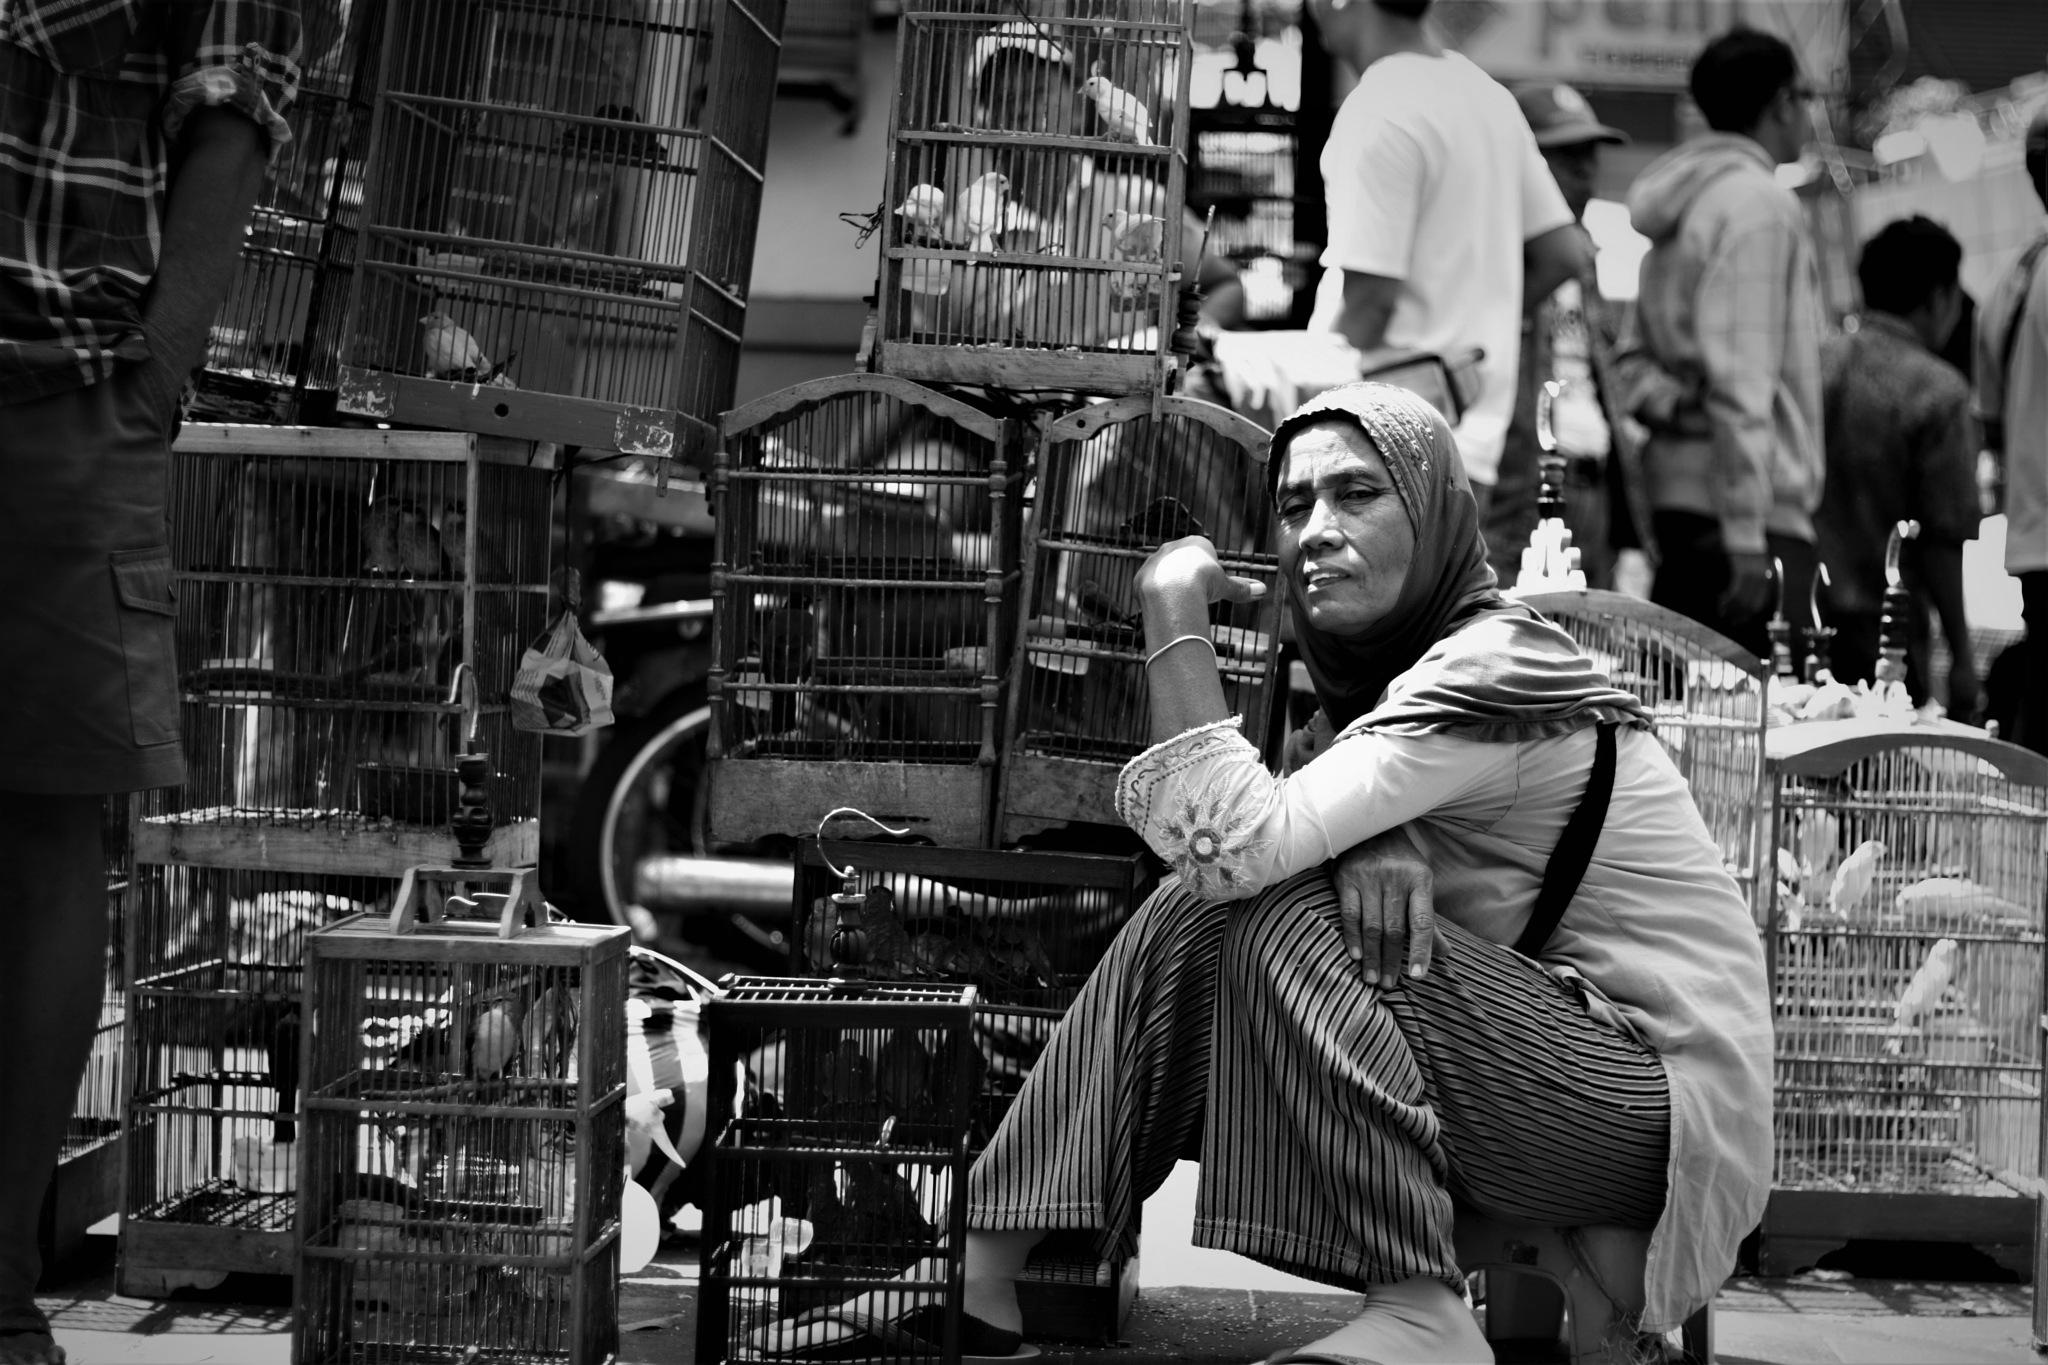 Pose Bersama by Bayu Ari Sugiarto